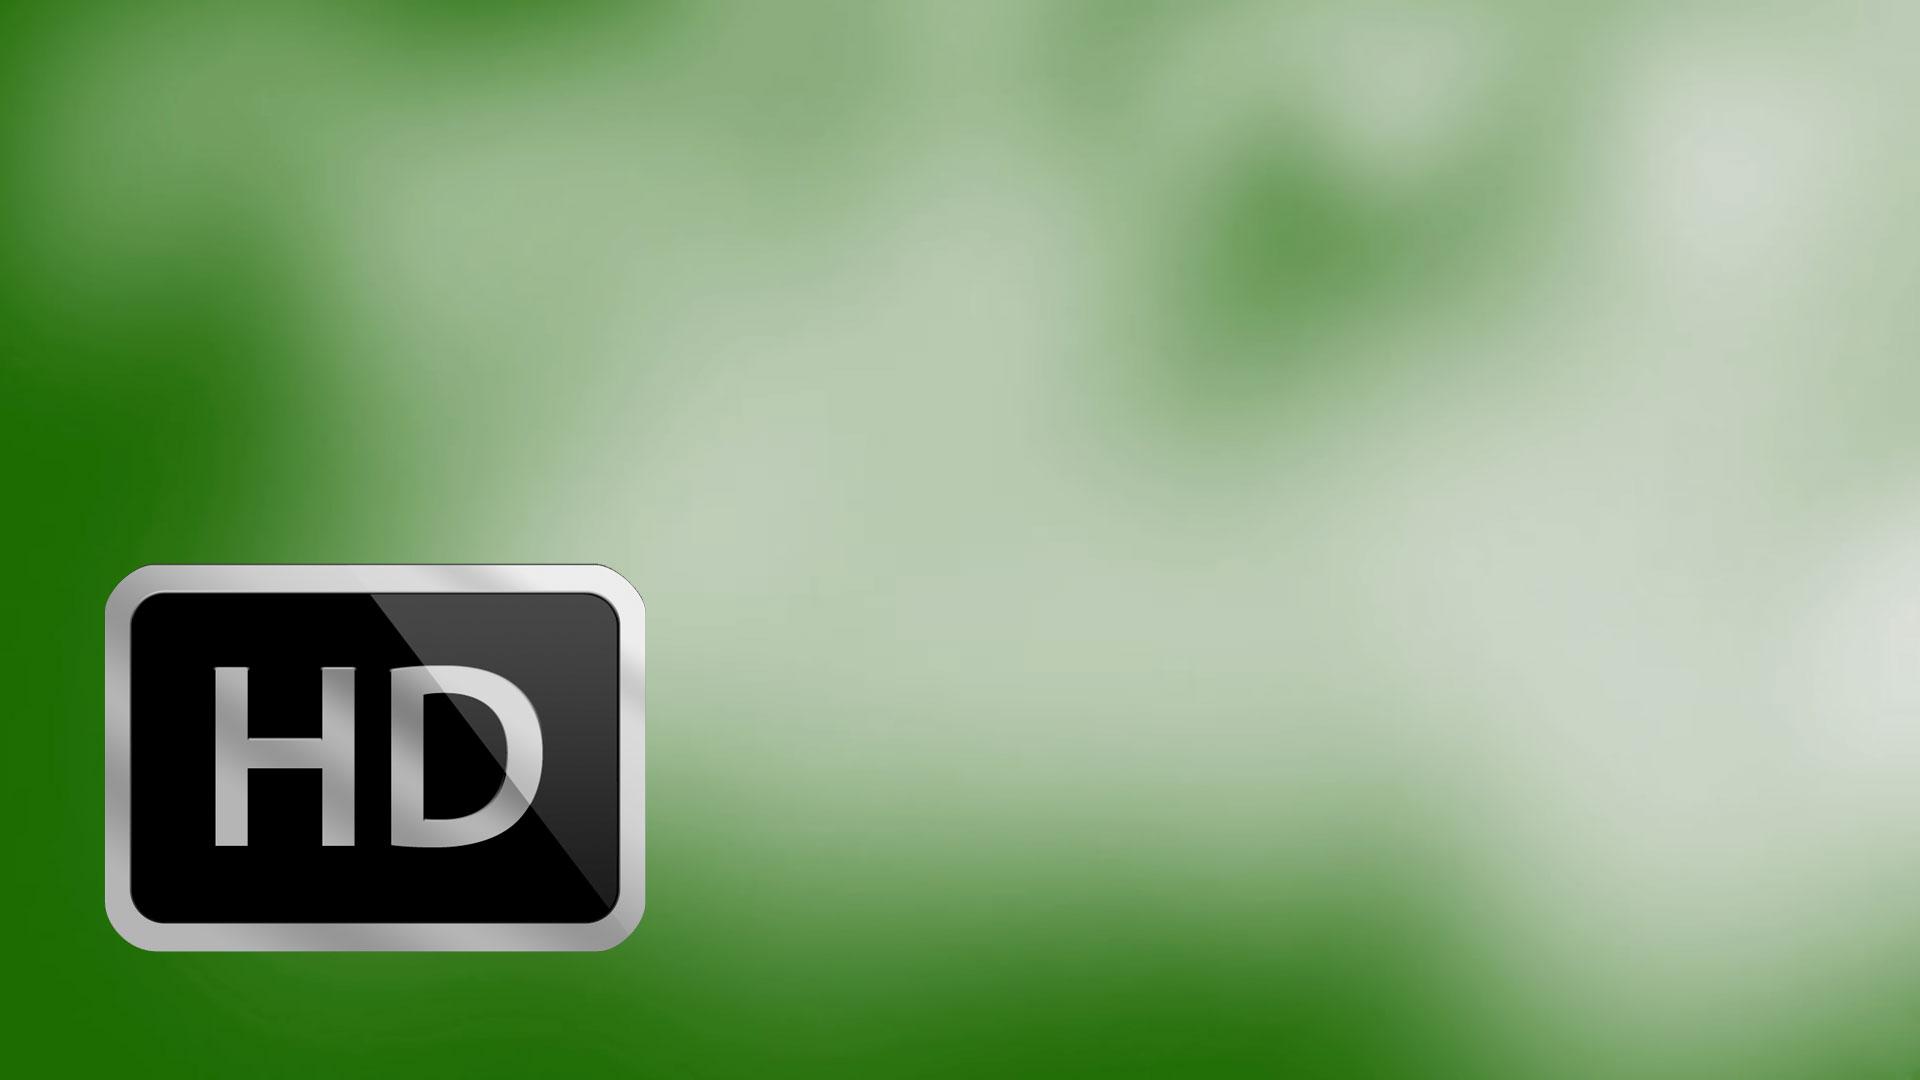 Fog Smoke Green Screen Effect-Free Download | All Design Creative